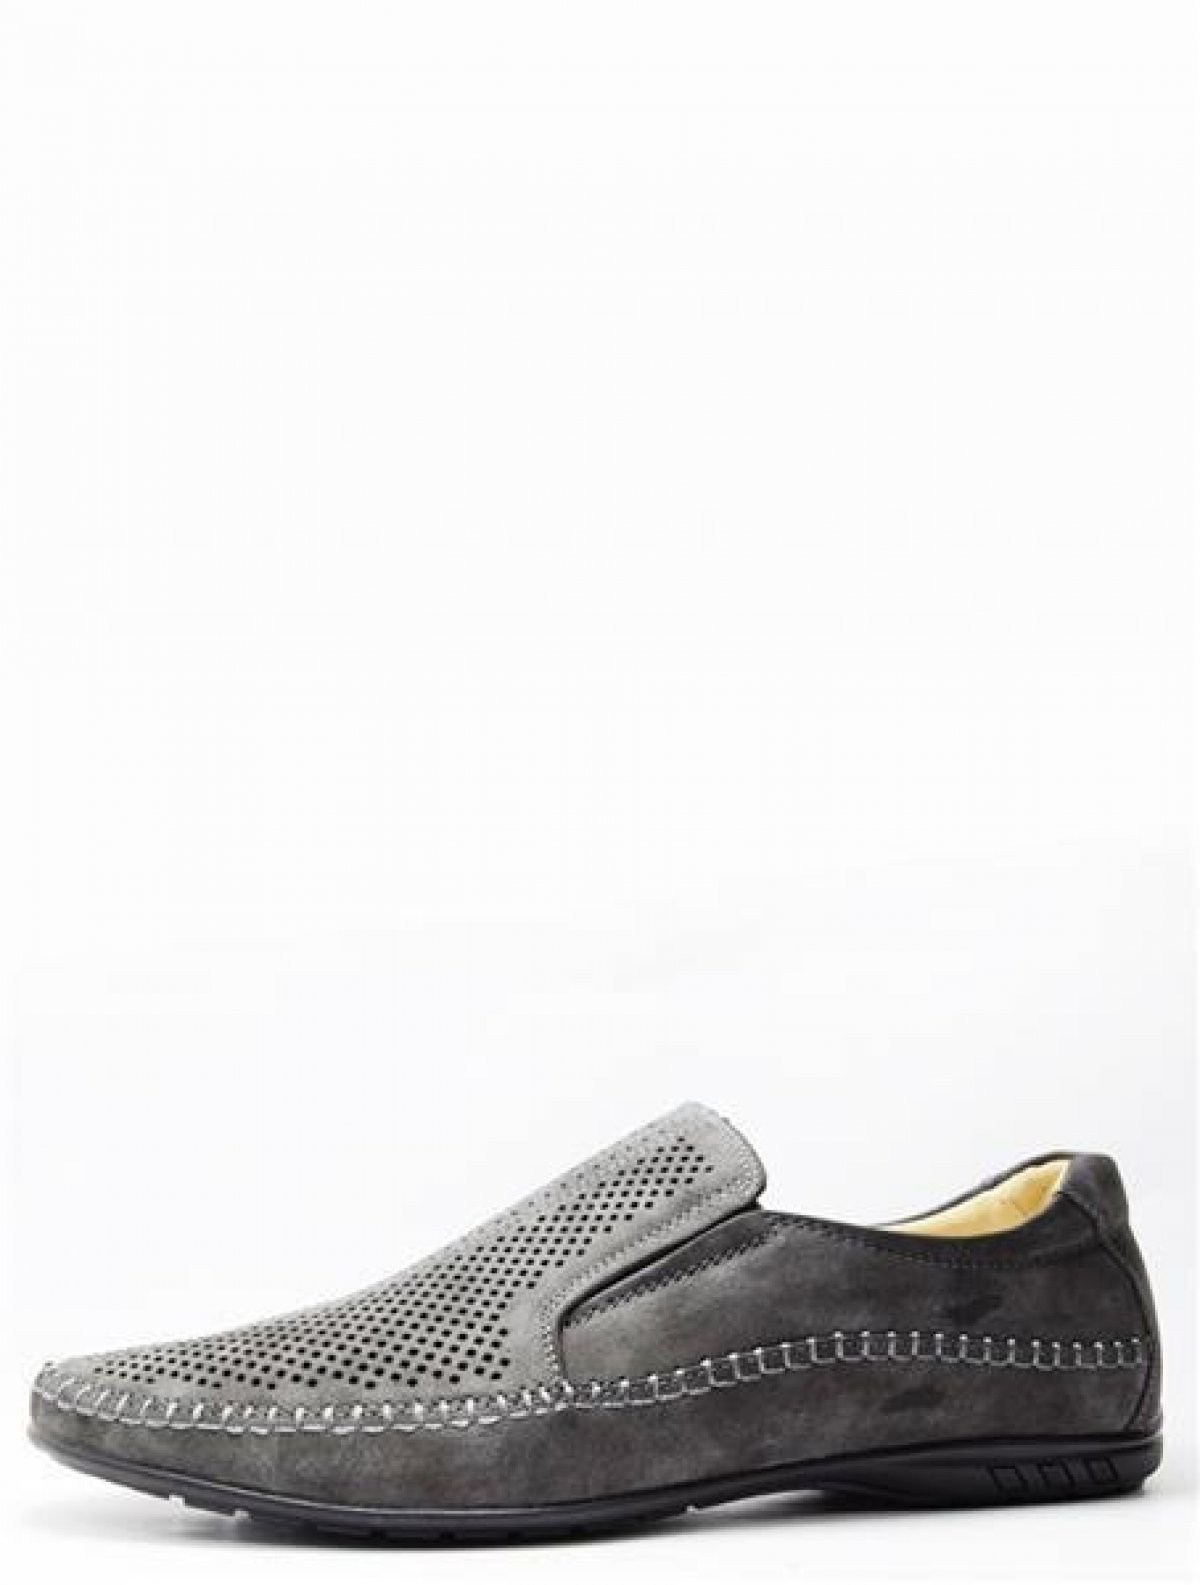 Carido P661713-C117A мужские туфли